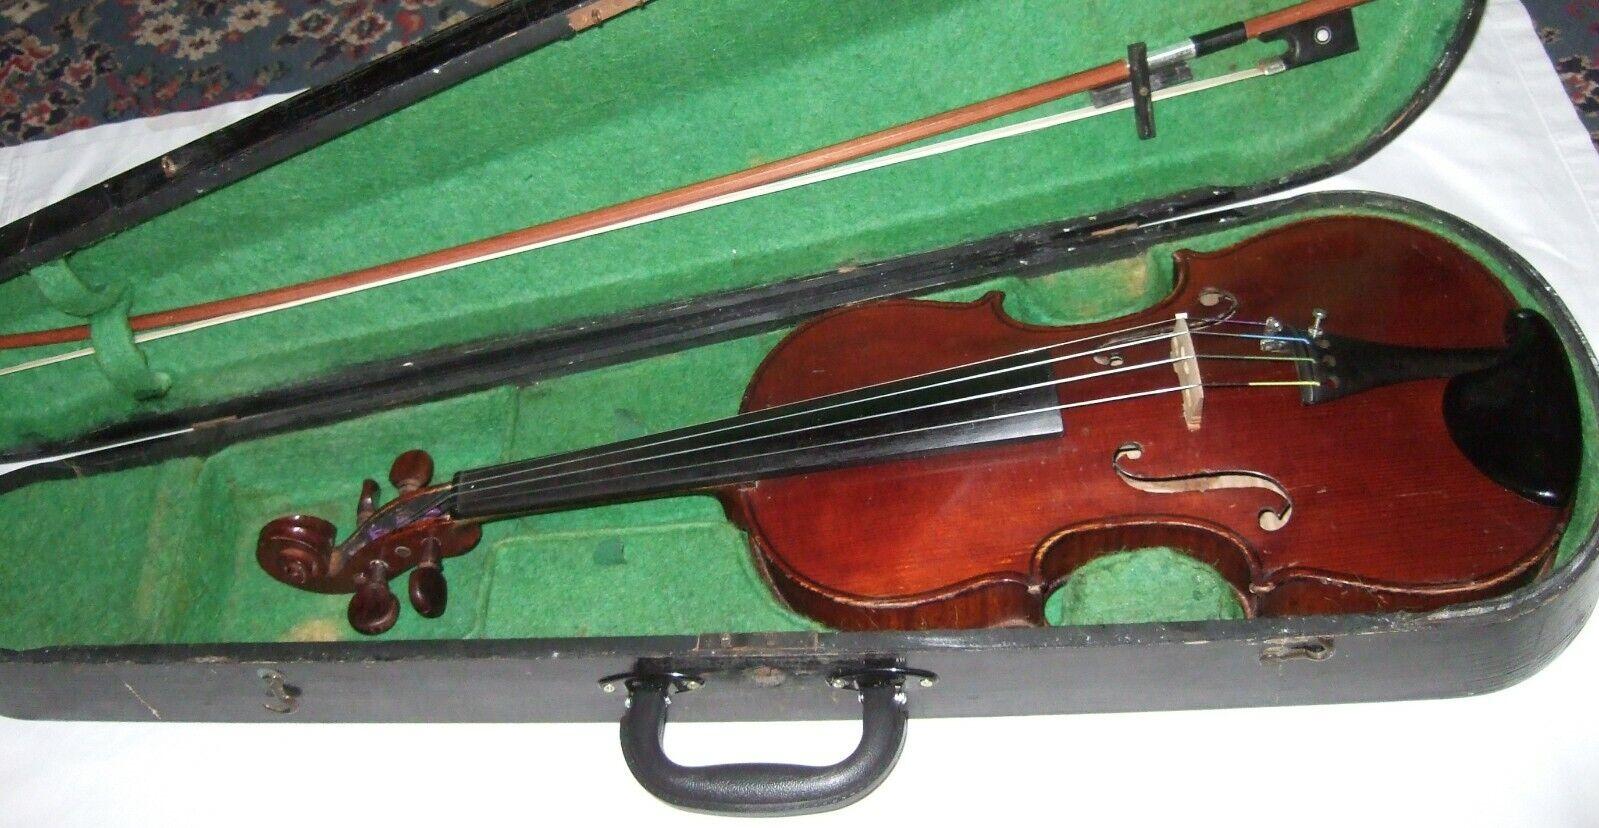 Fine example of The Maidstone 4 4 violin by Murdock & Murdoch, London VGC cased